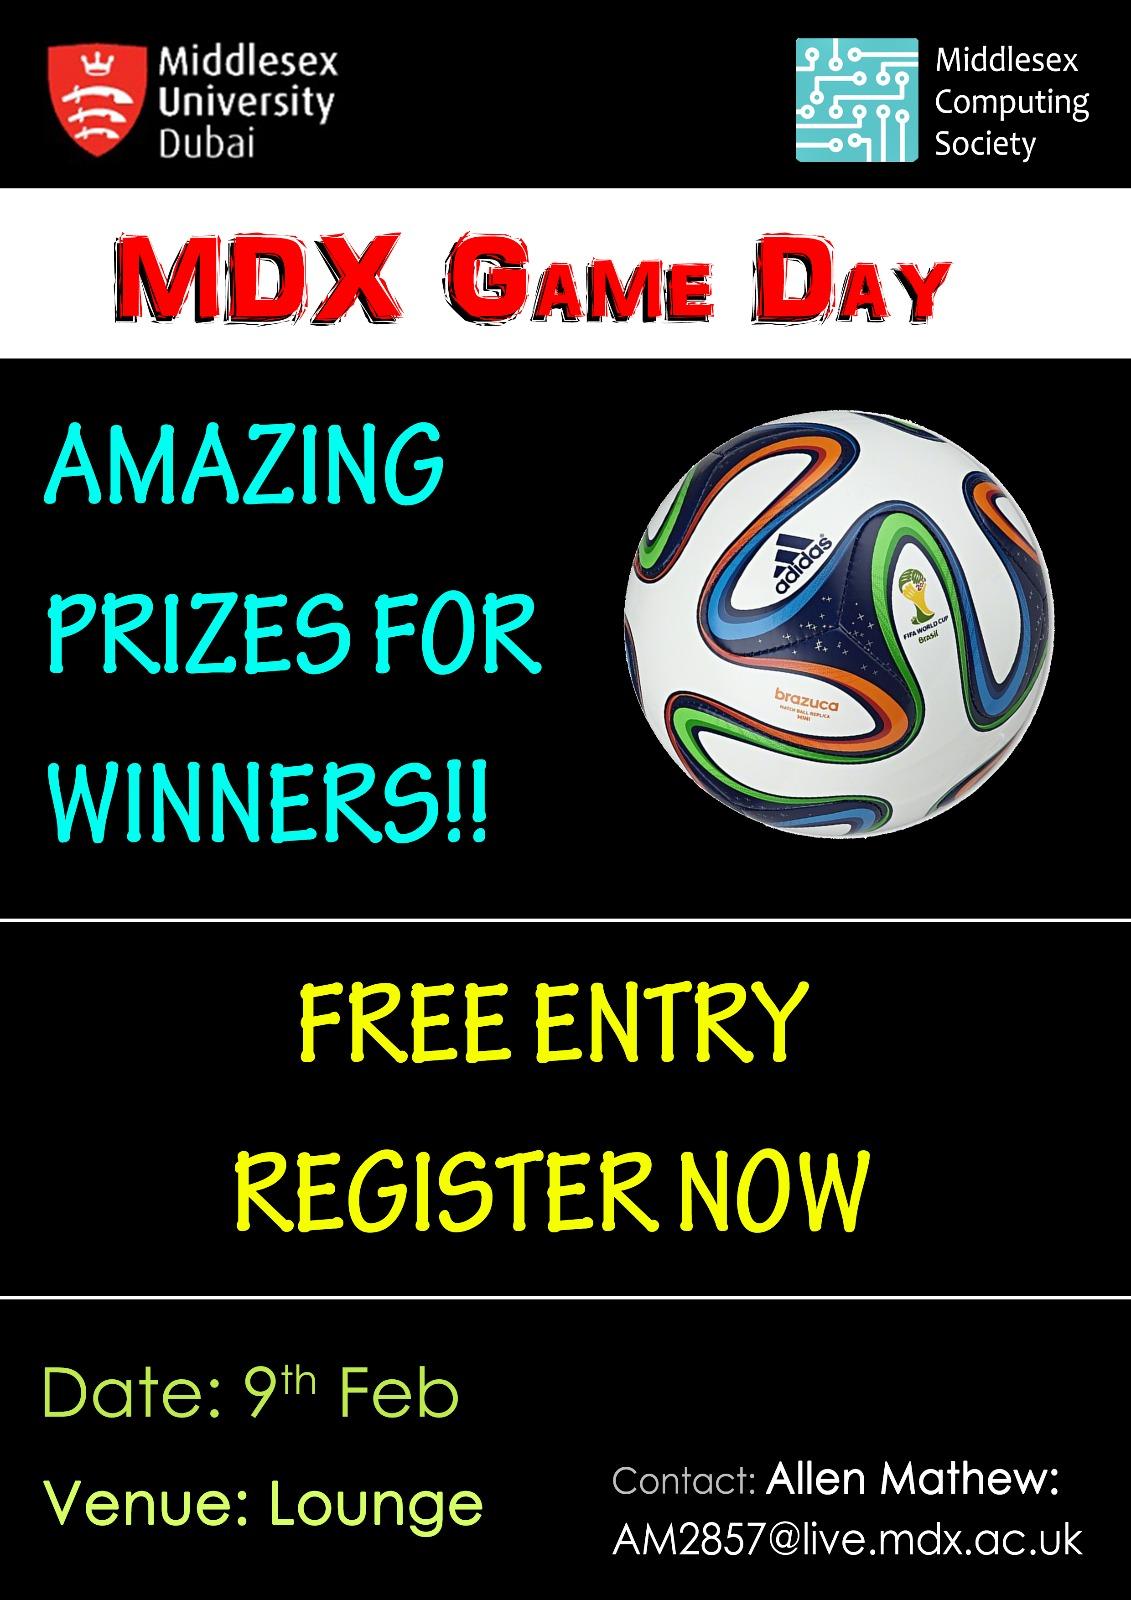 MDX GAME DAY